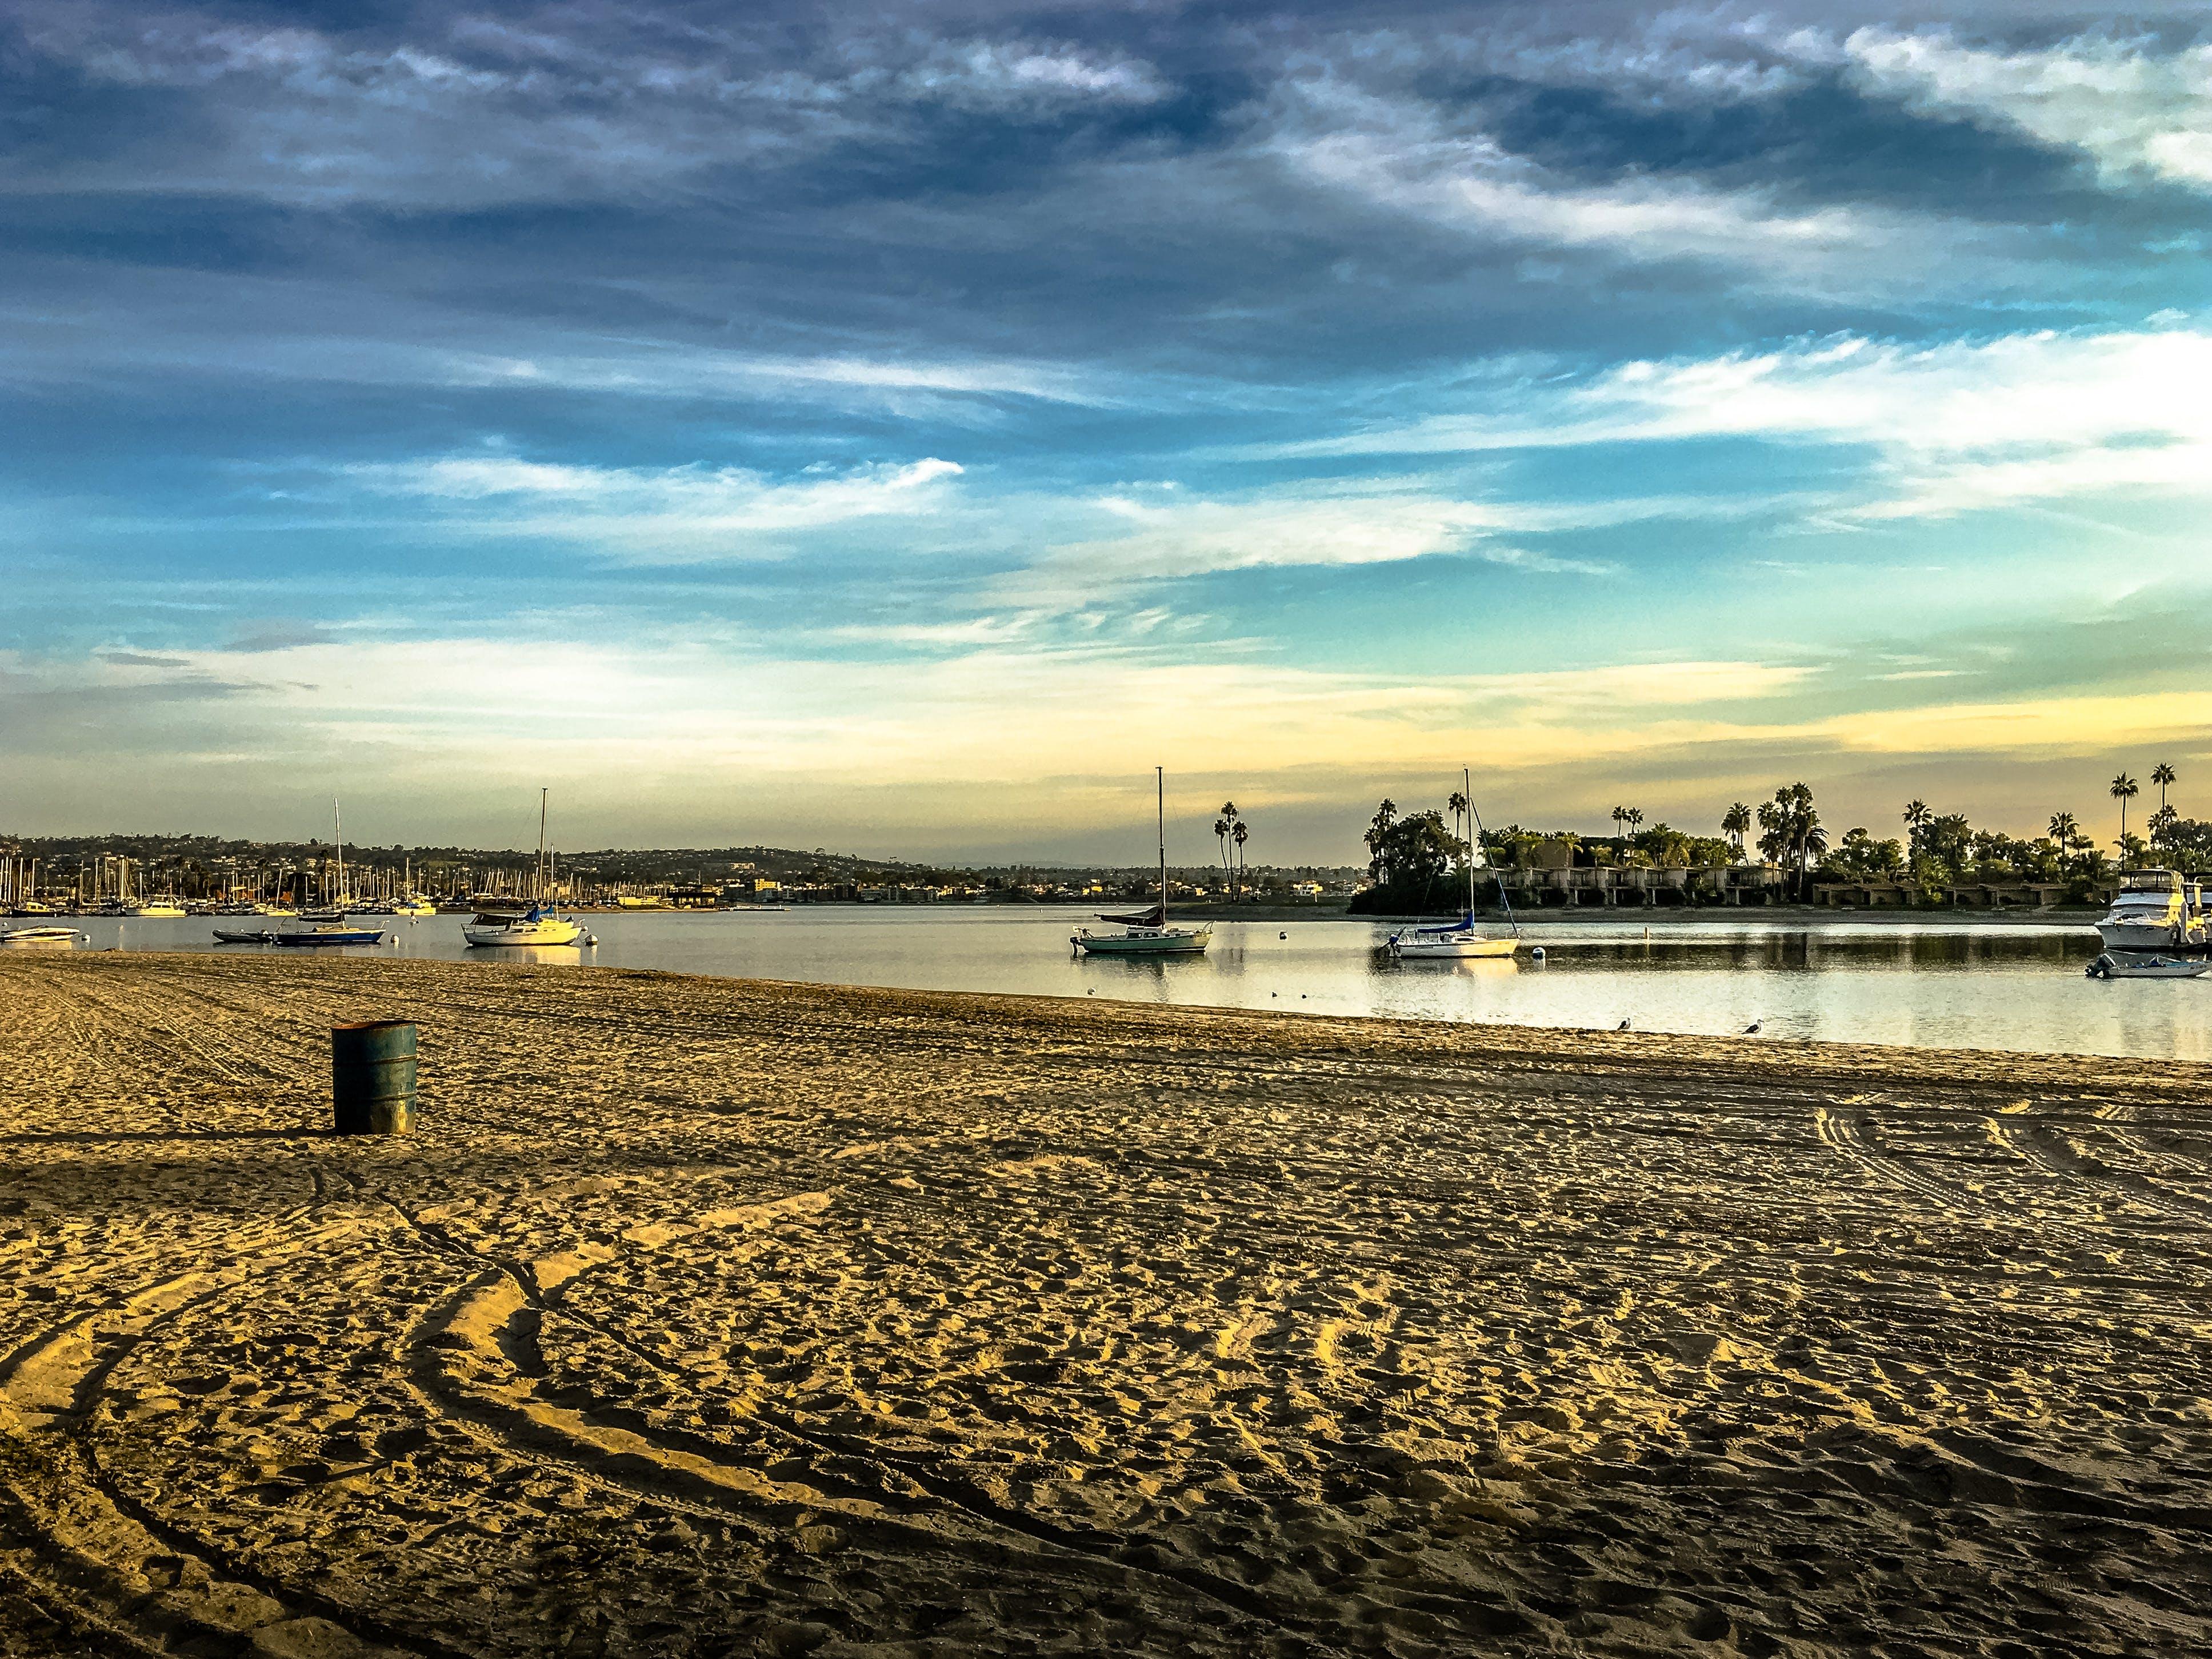 beach, beautiful, blue sky